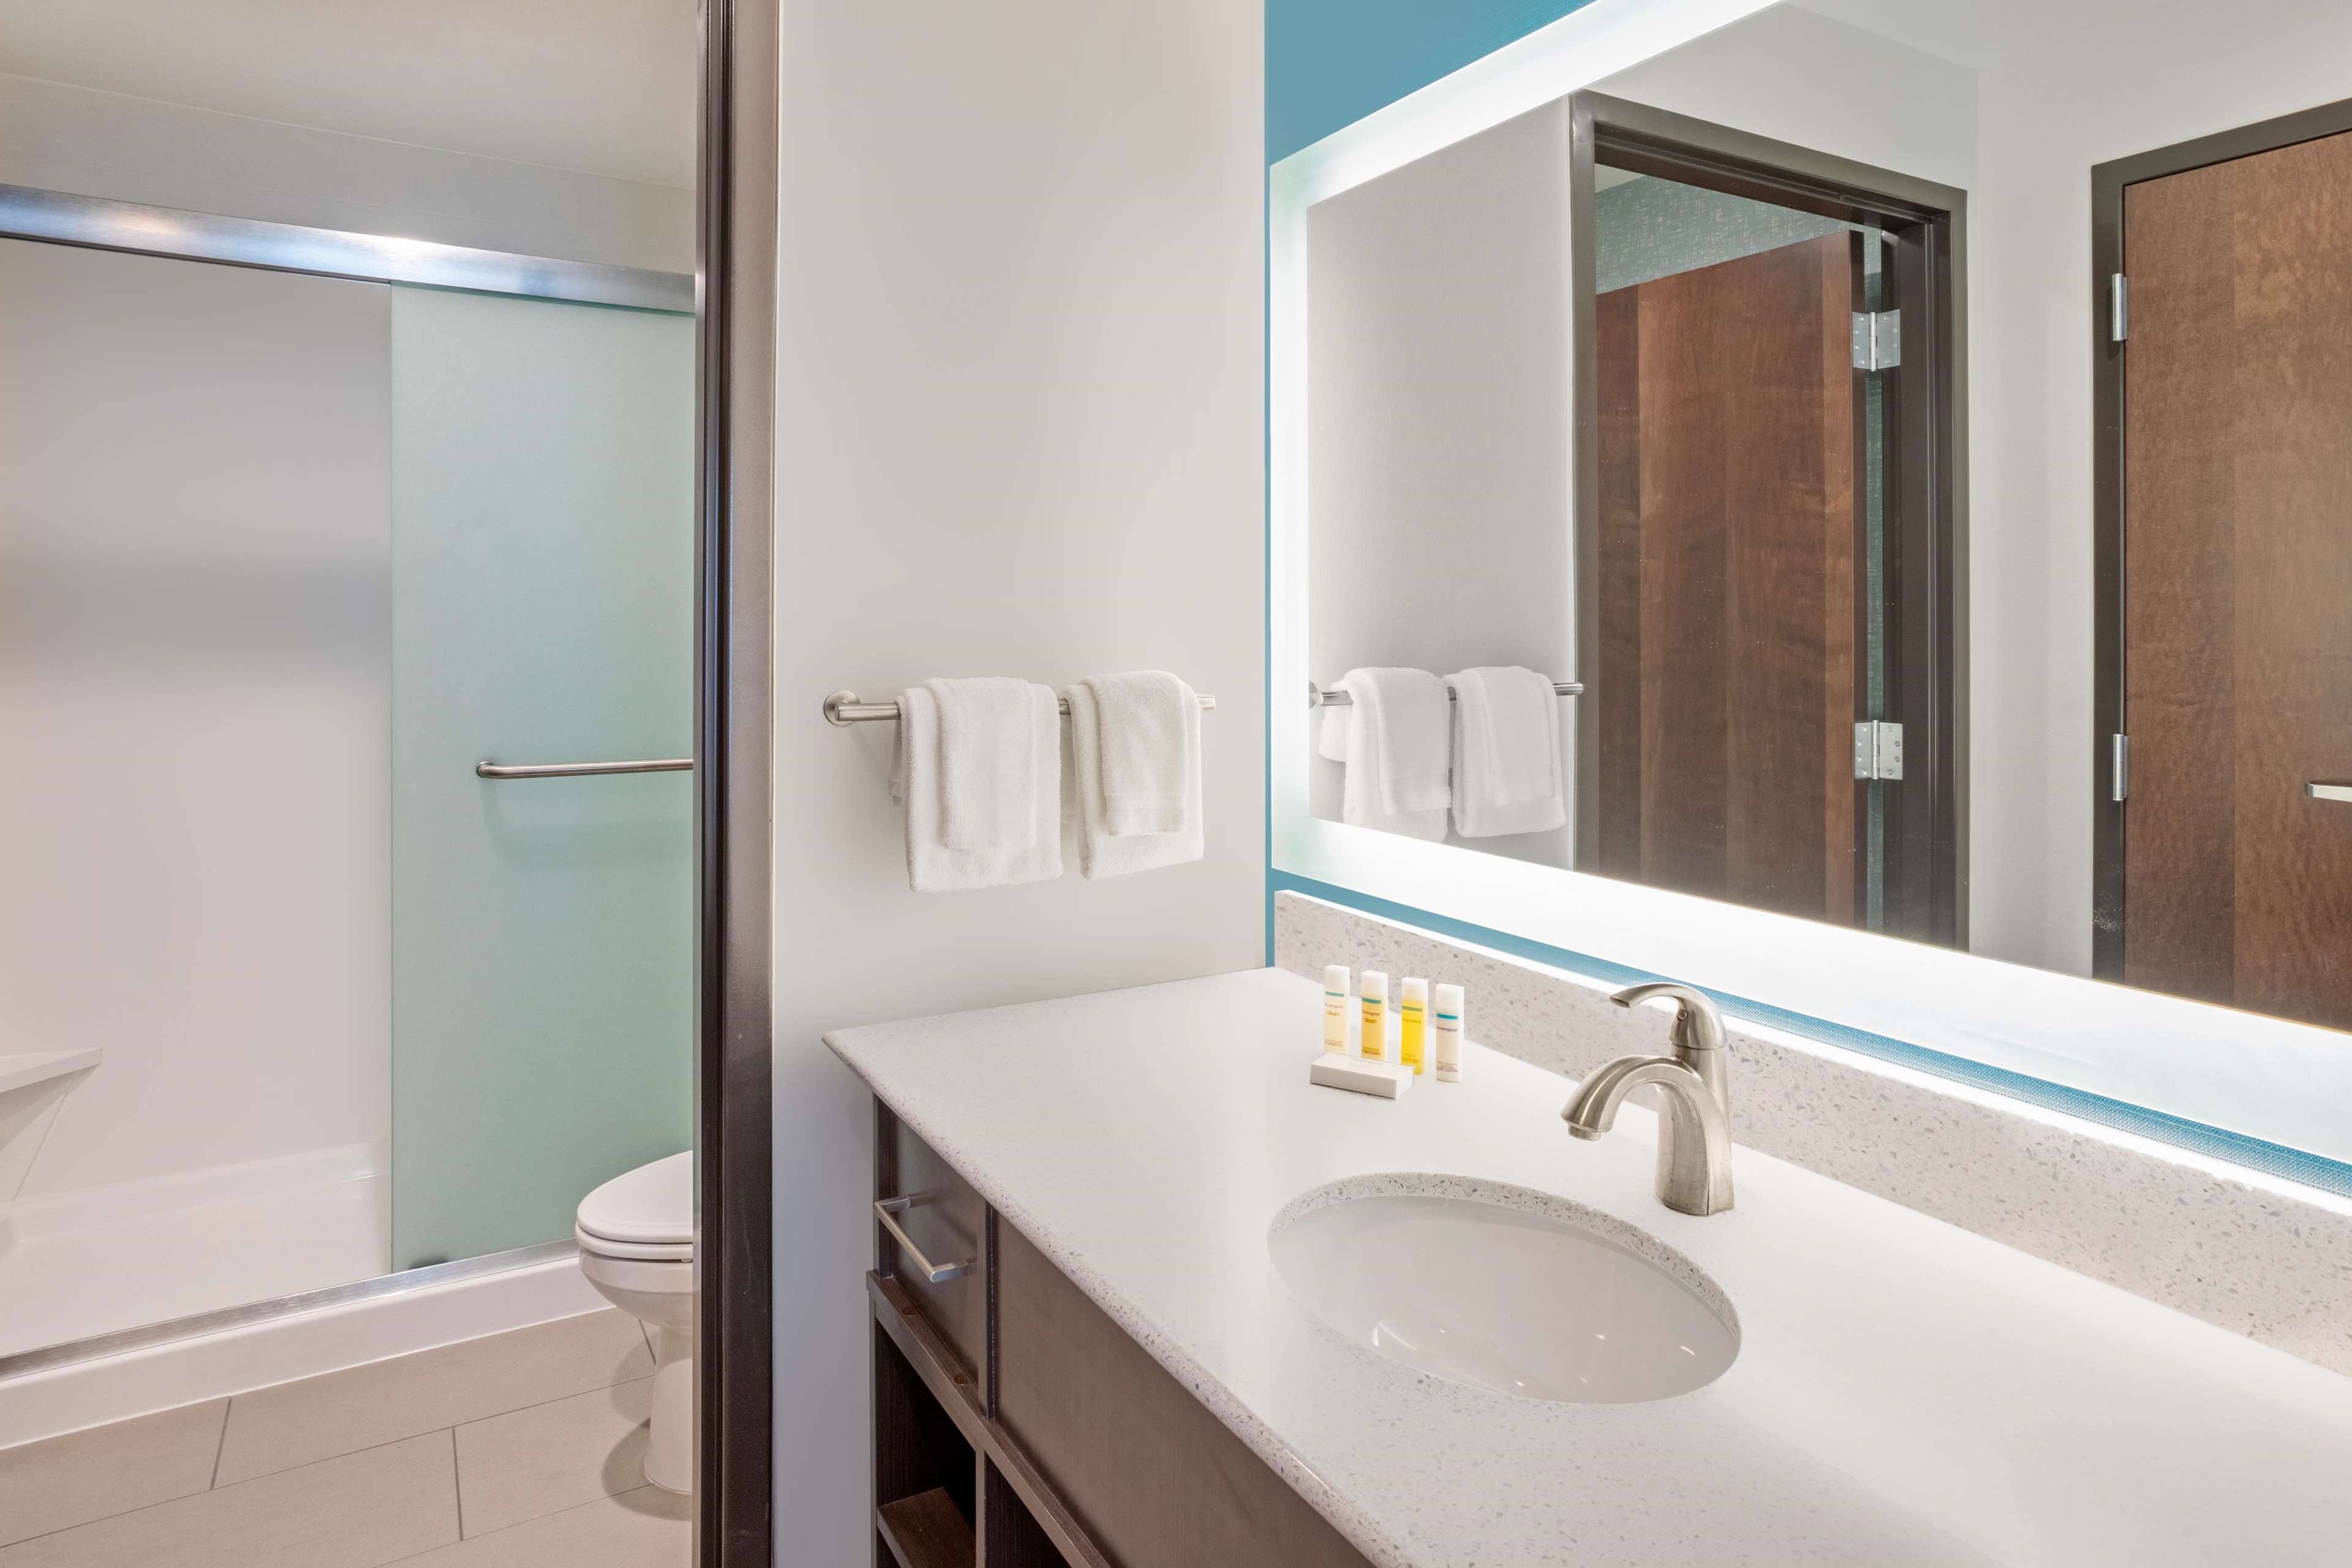 Homewood Suites by Hilton Edina Minneapolis image 15